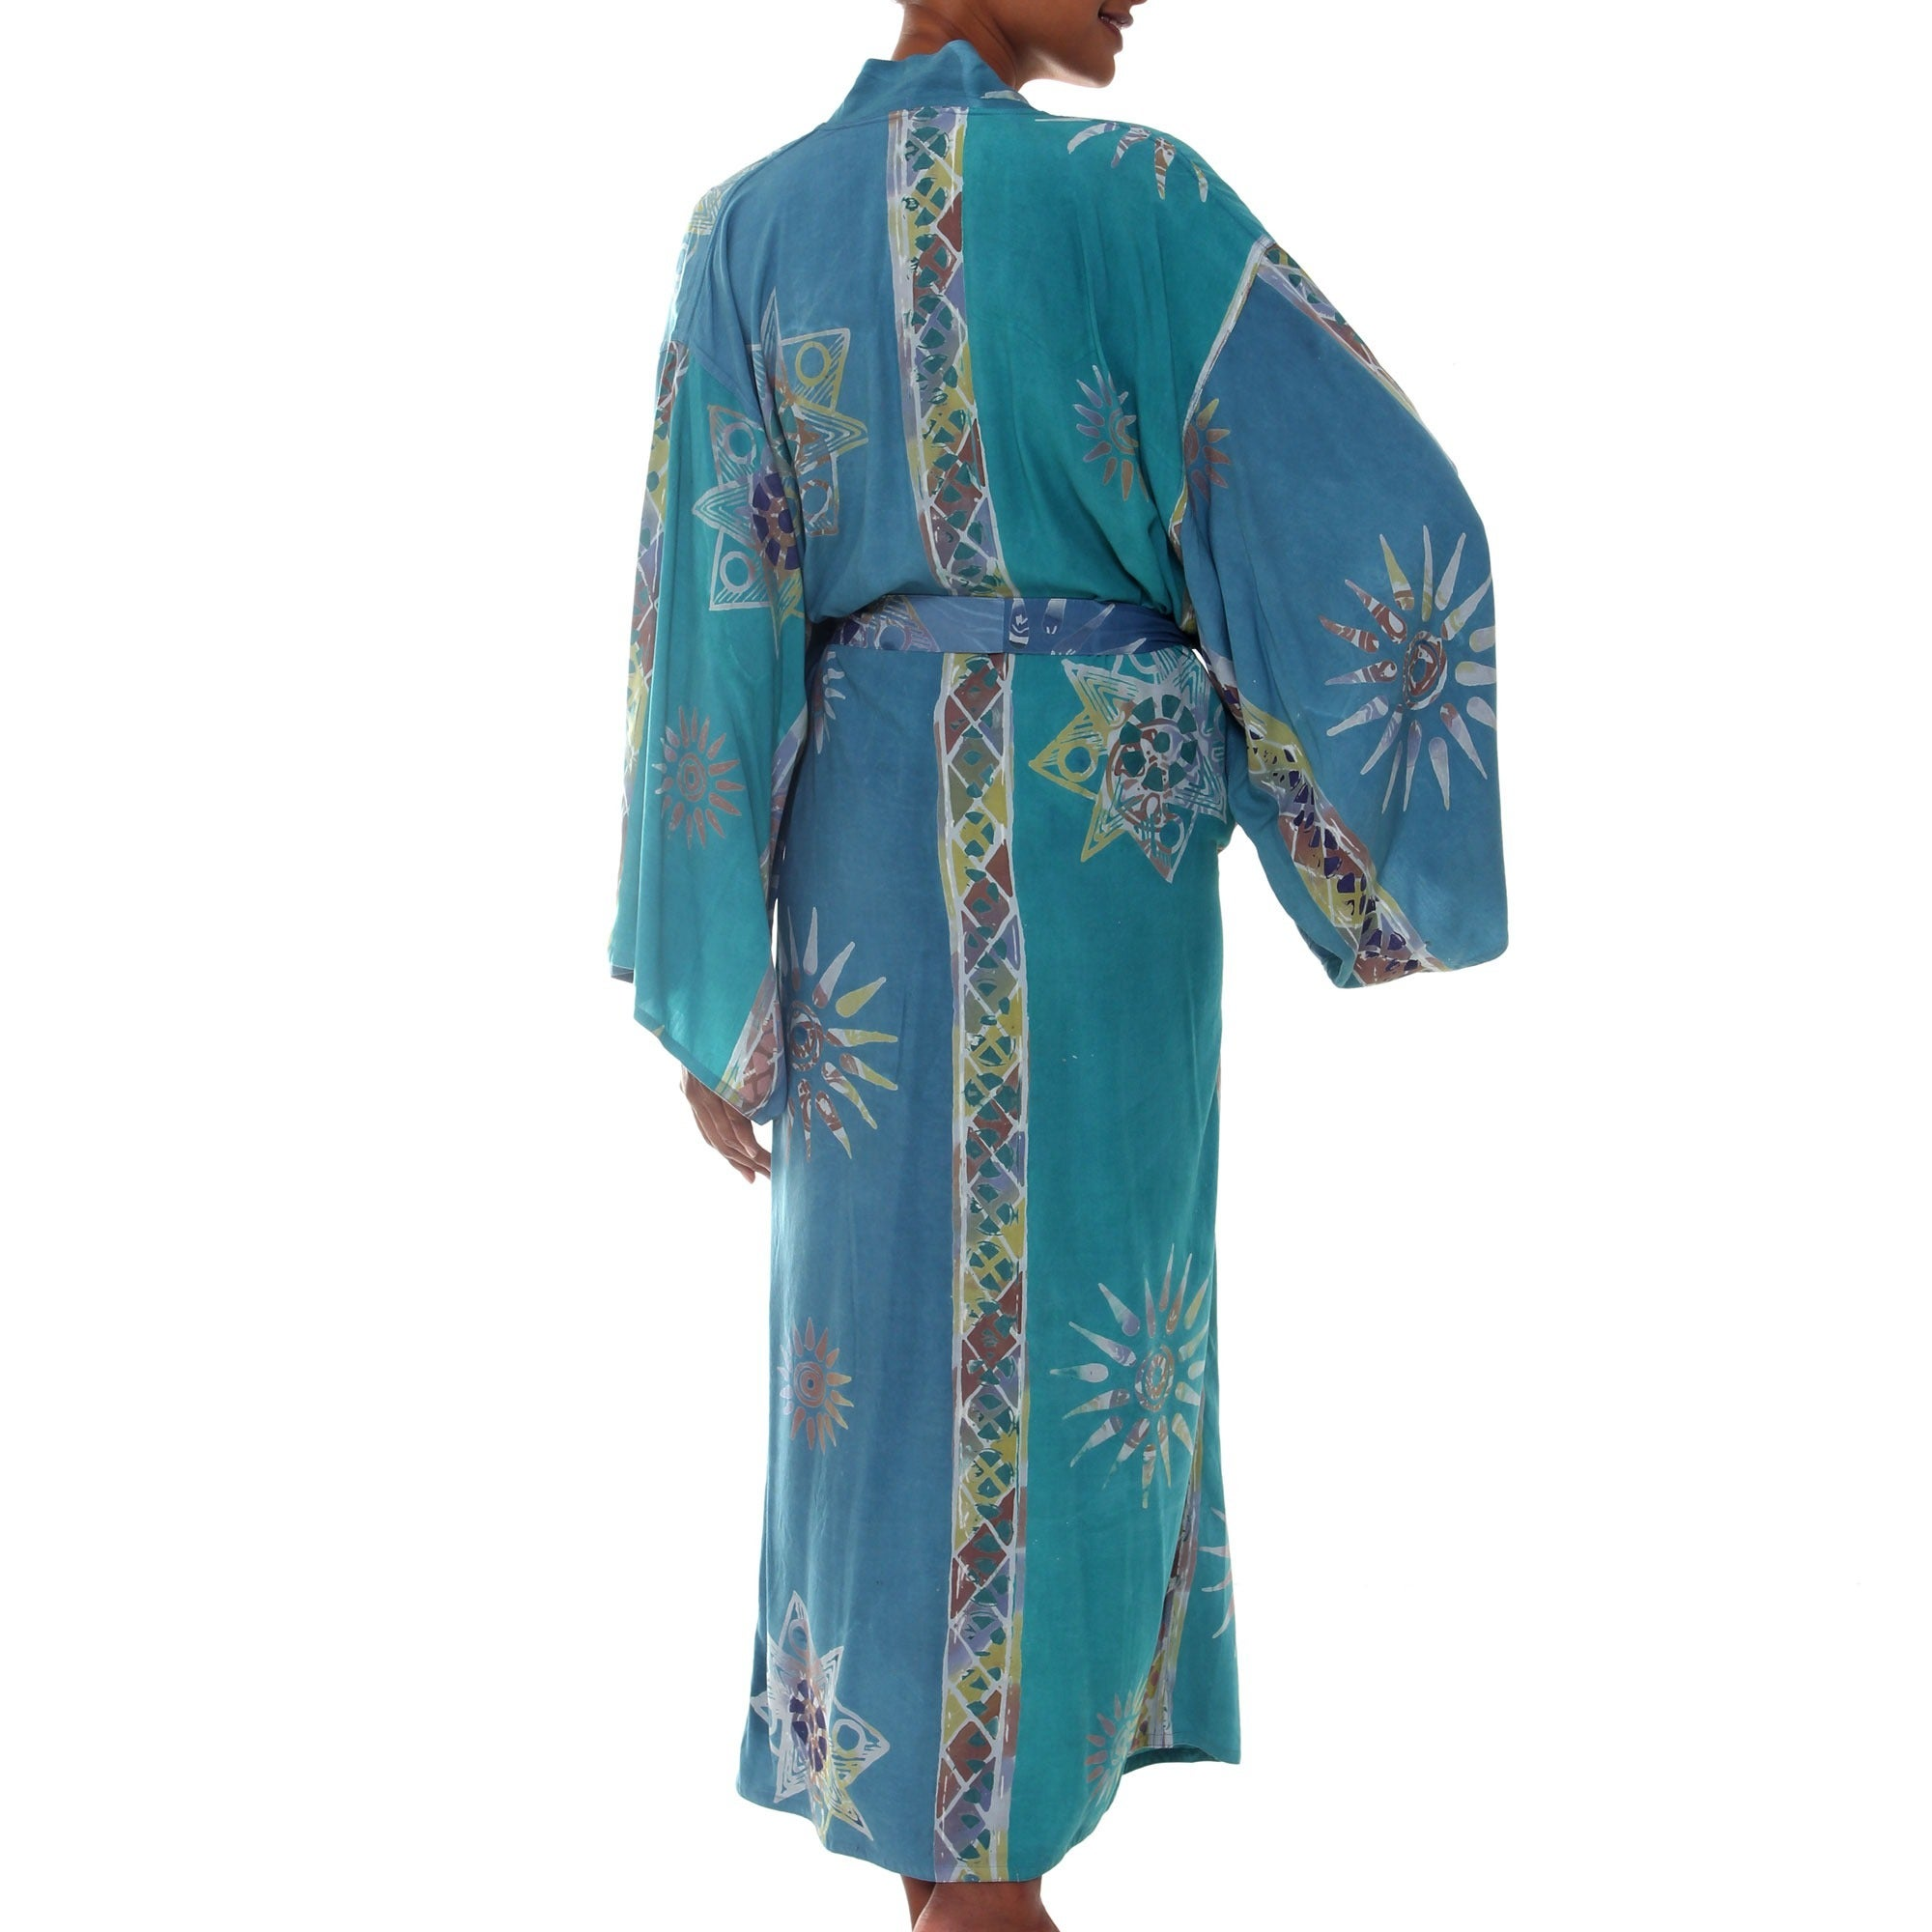 0a48aca7e7f Shop Handmade Green Baliku Artisan Designer Women s Clothing Fashion Batik Bath  Robe (Indonesia) - On Sale - Free Shipping Today - Overstock - 7710664